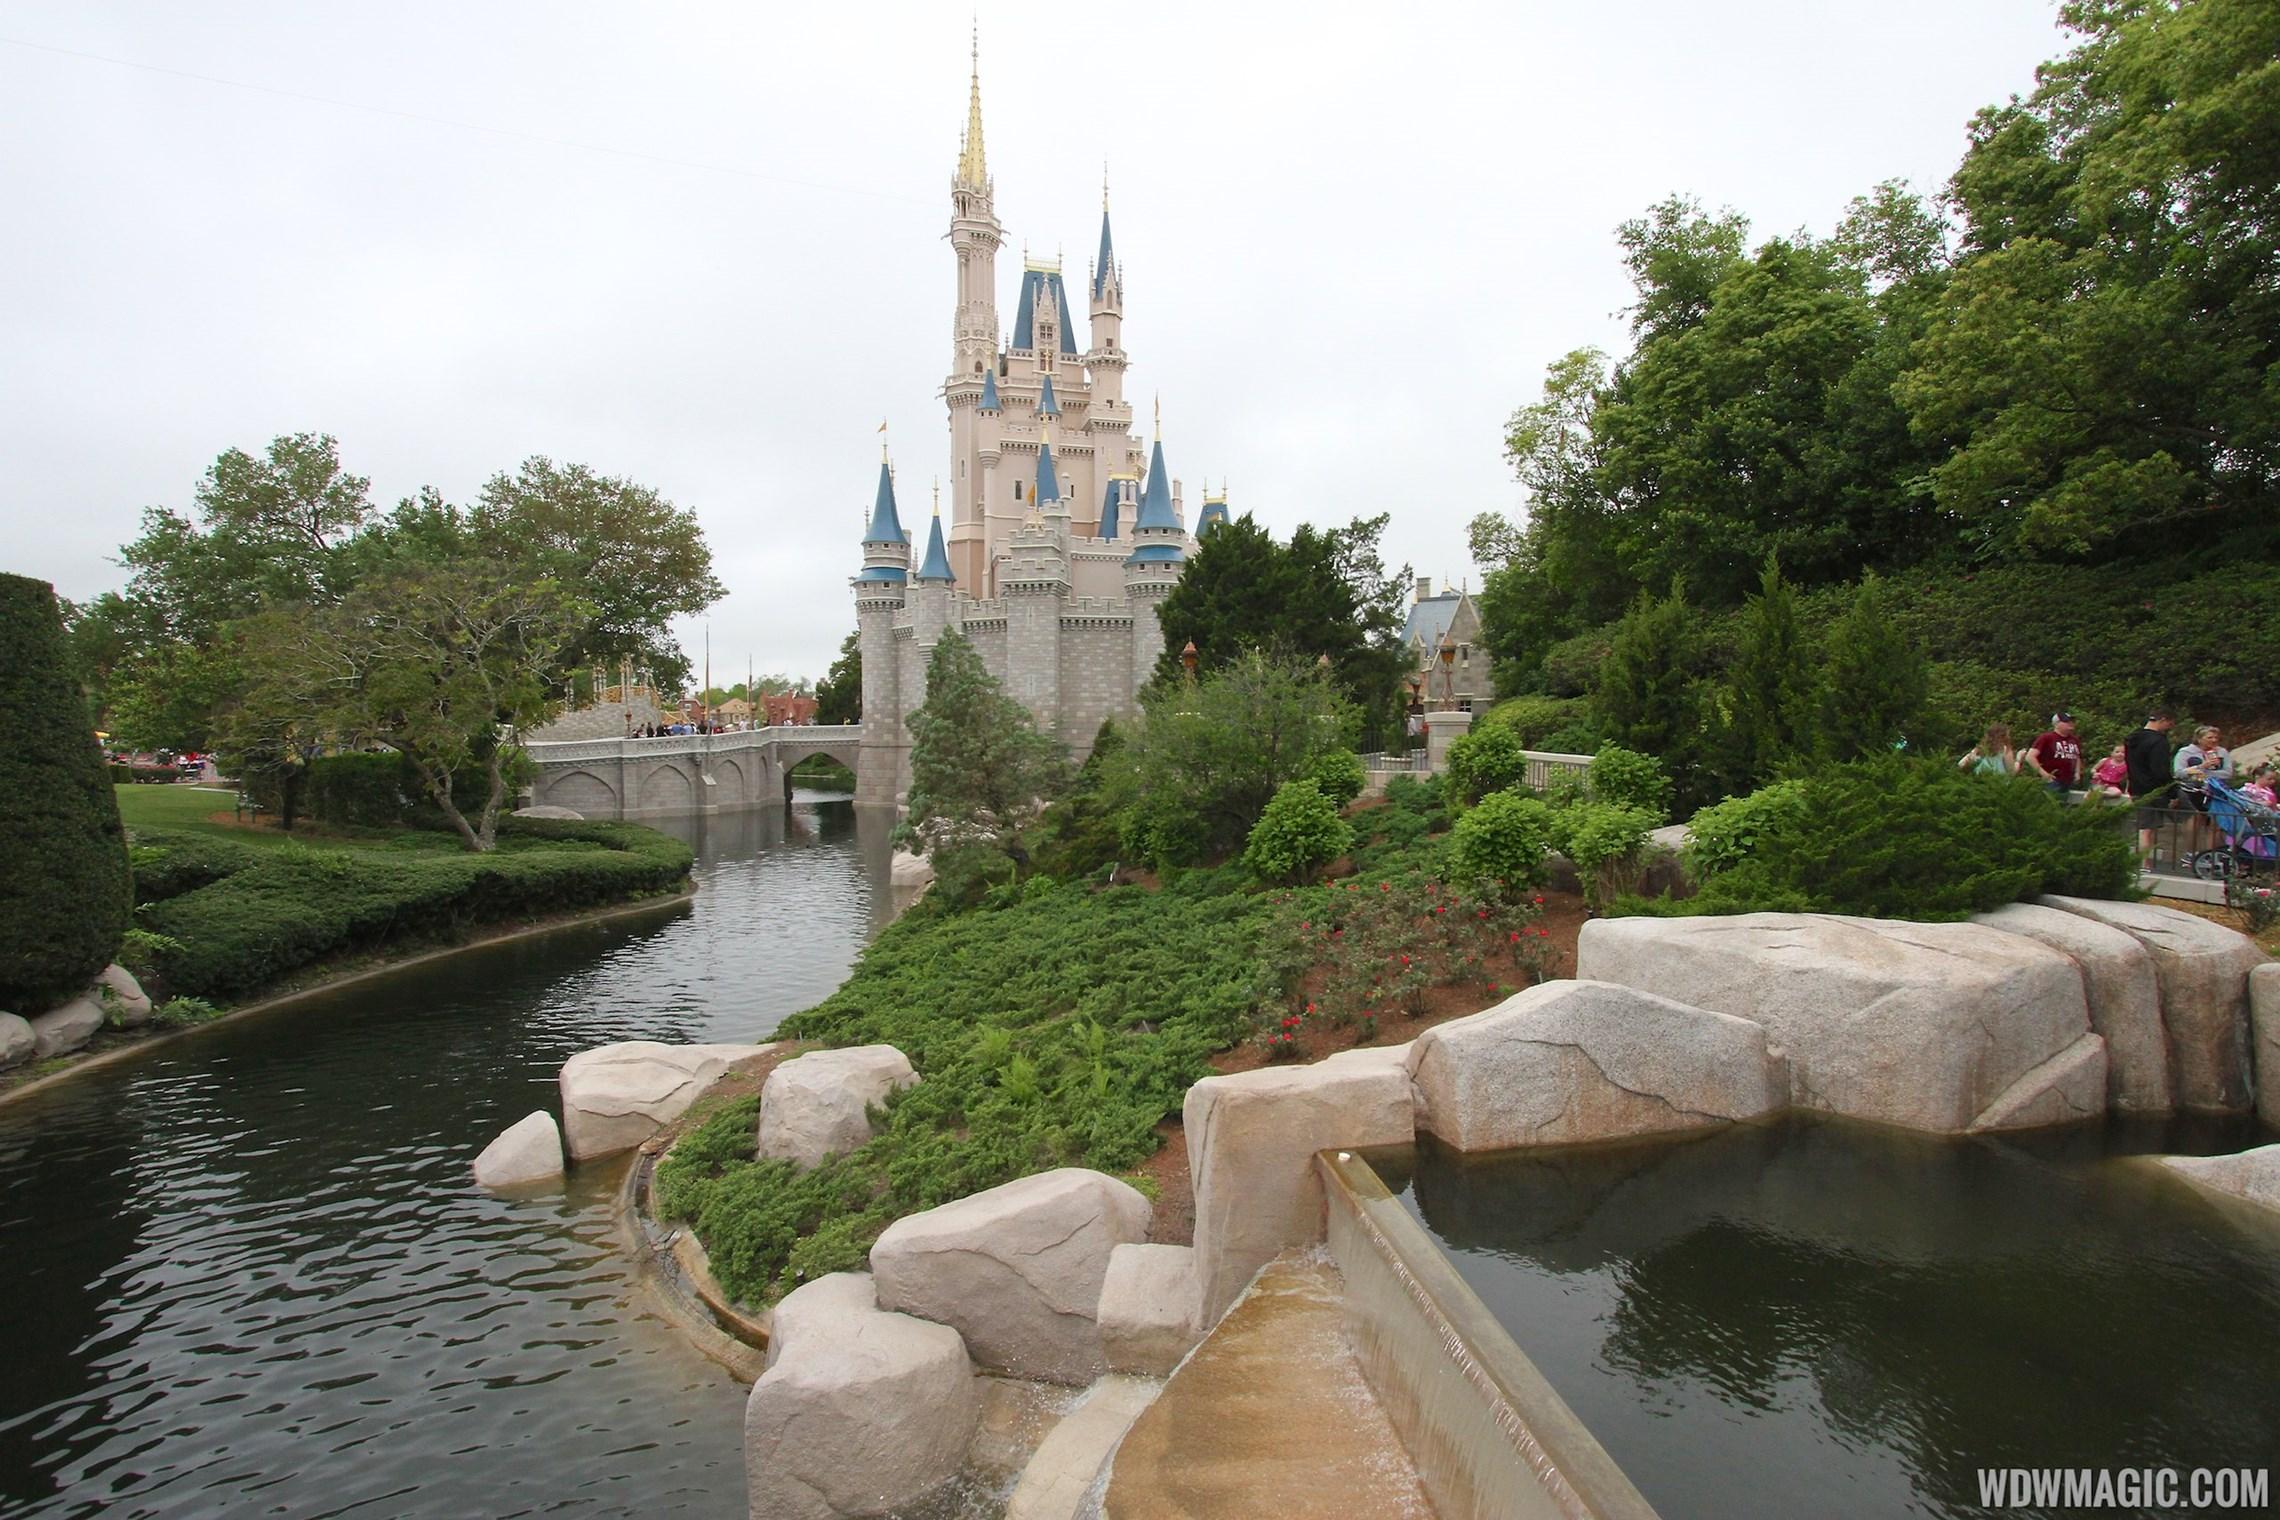 Magic Kingdom moat refilled